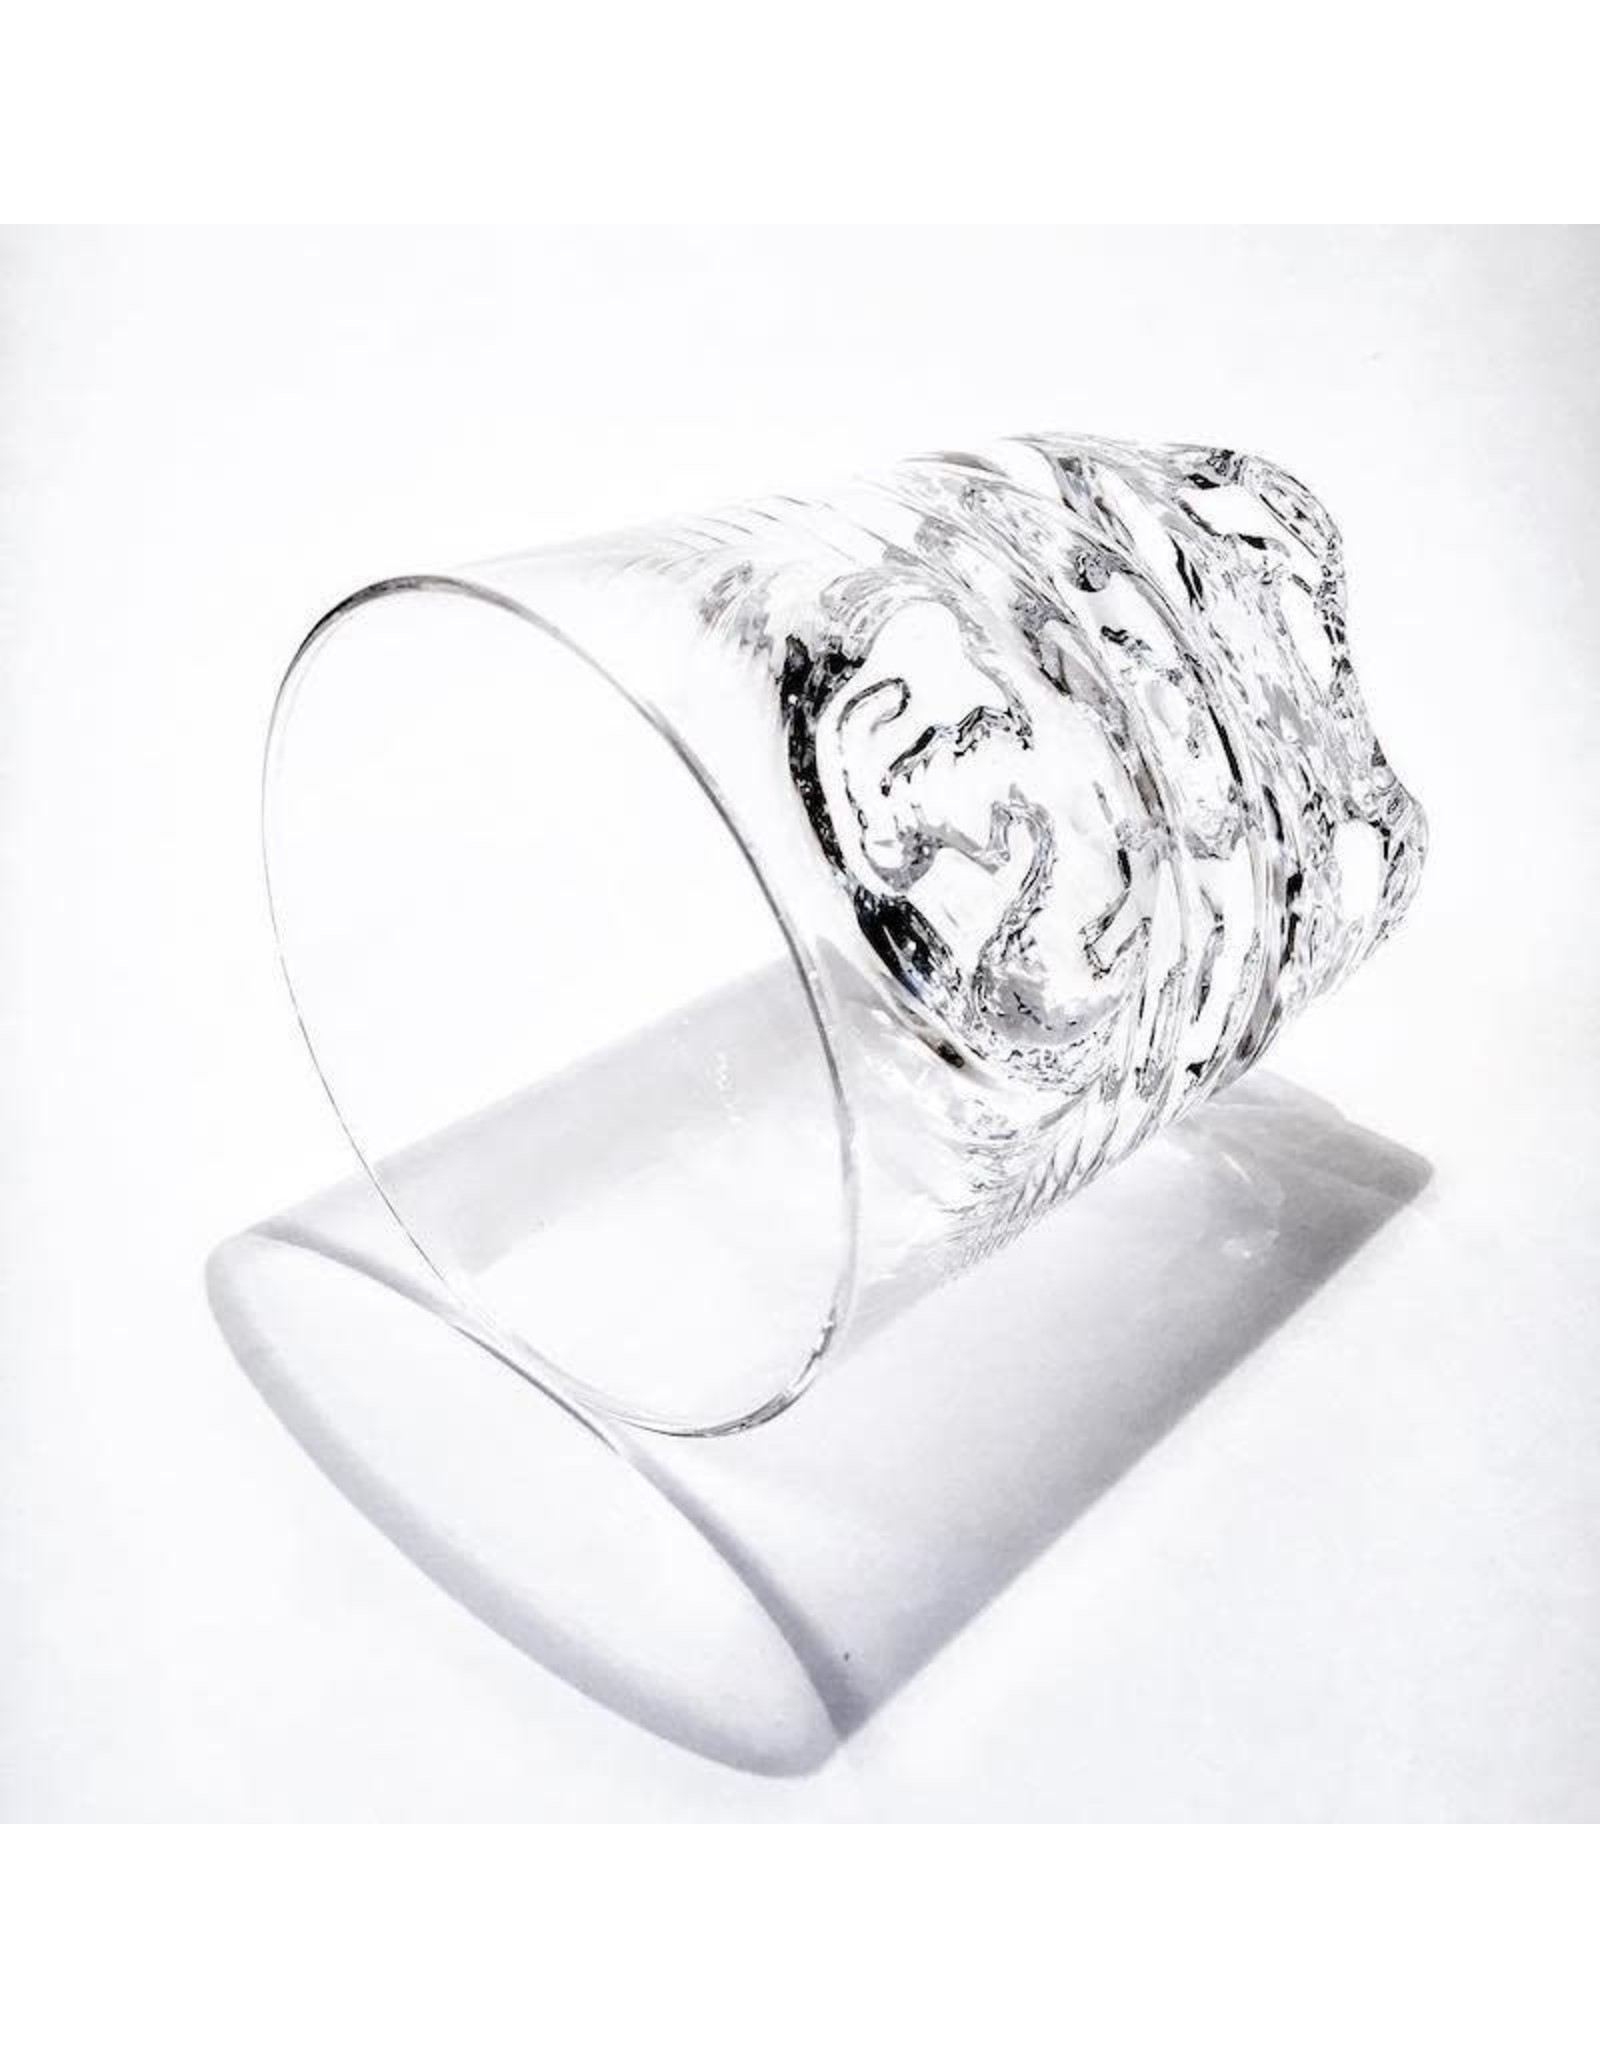 GAISSA O.F., 22 CL 酒杯